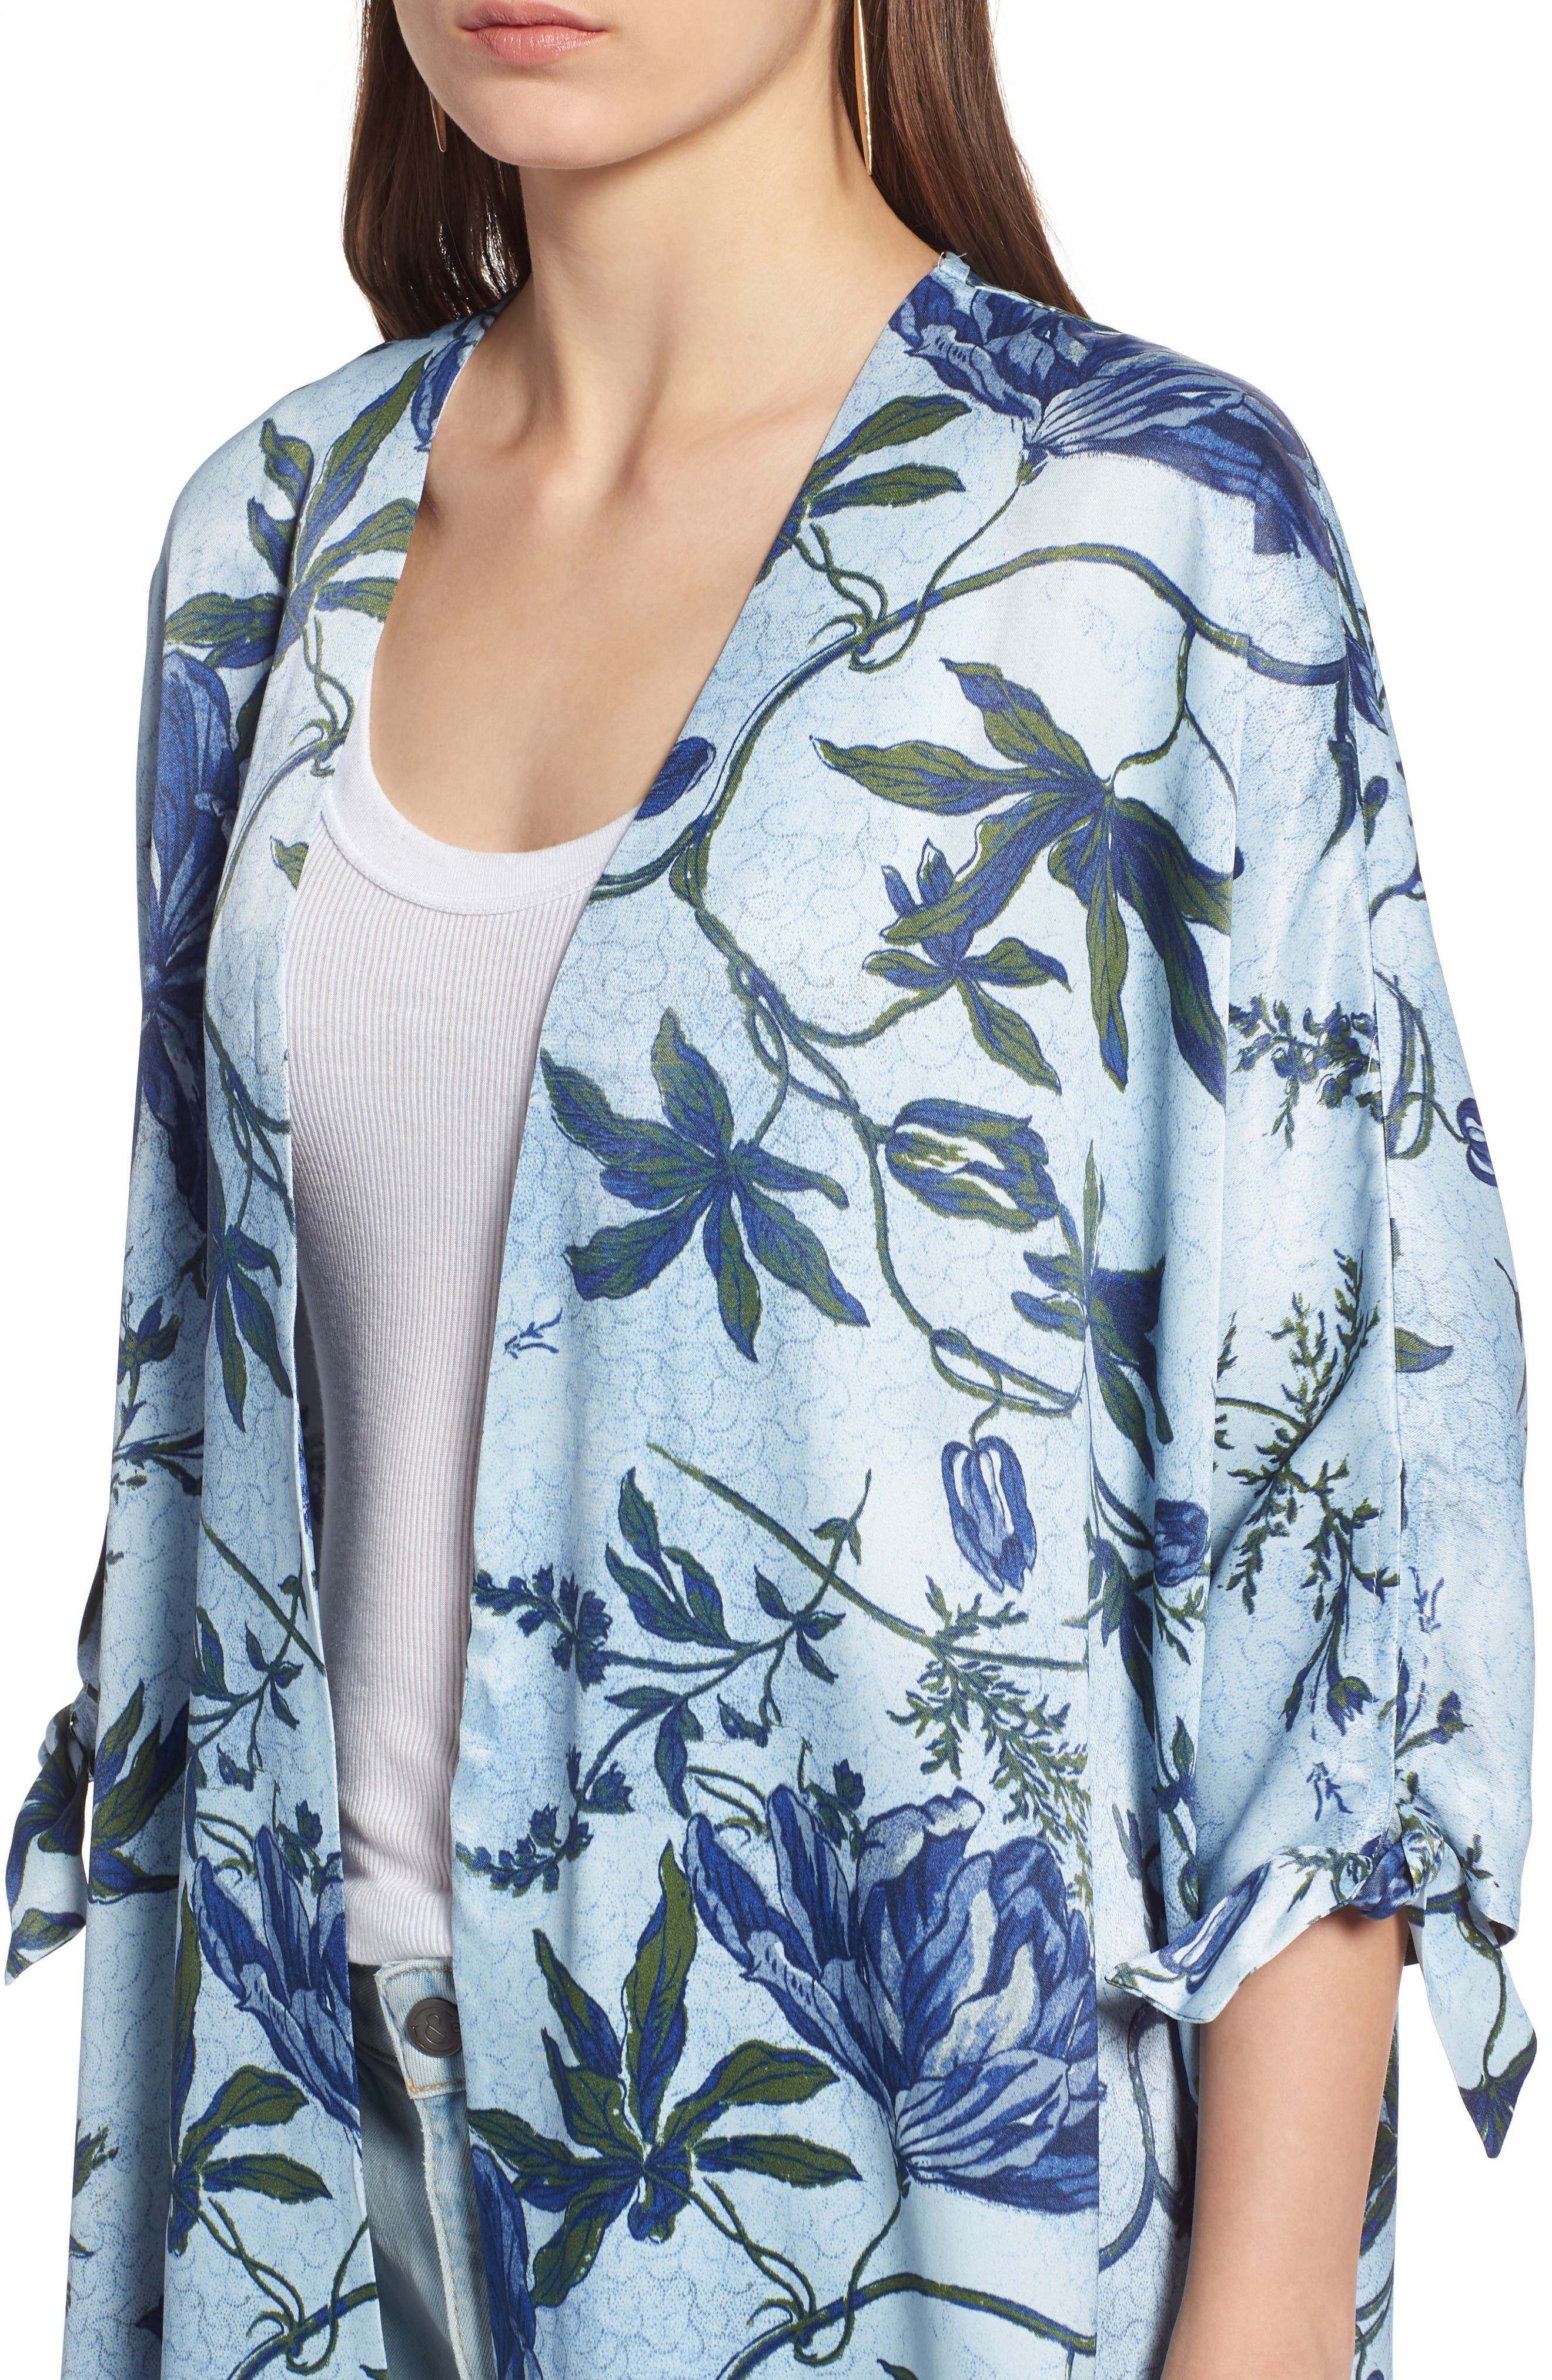 High/Low Kimono,                             Alternate thumbnail 4, color,                             Blue Trailing Vines Floral